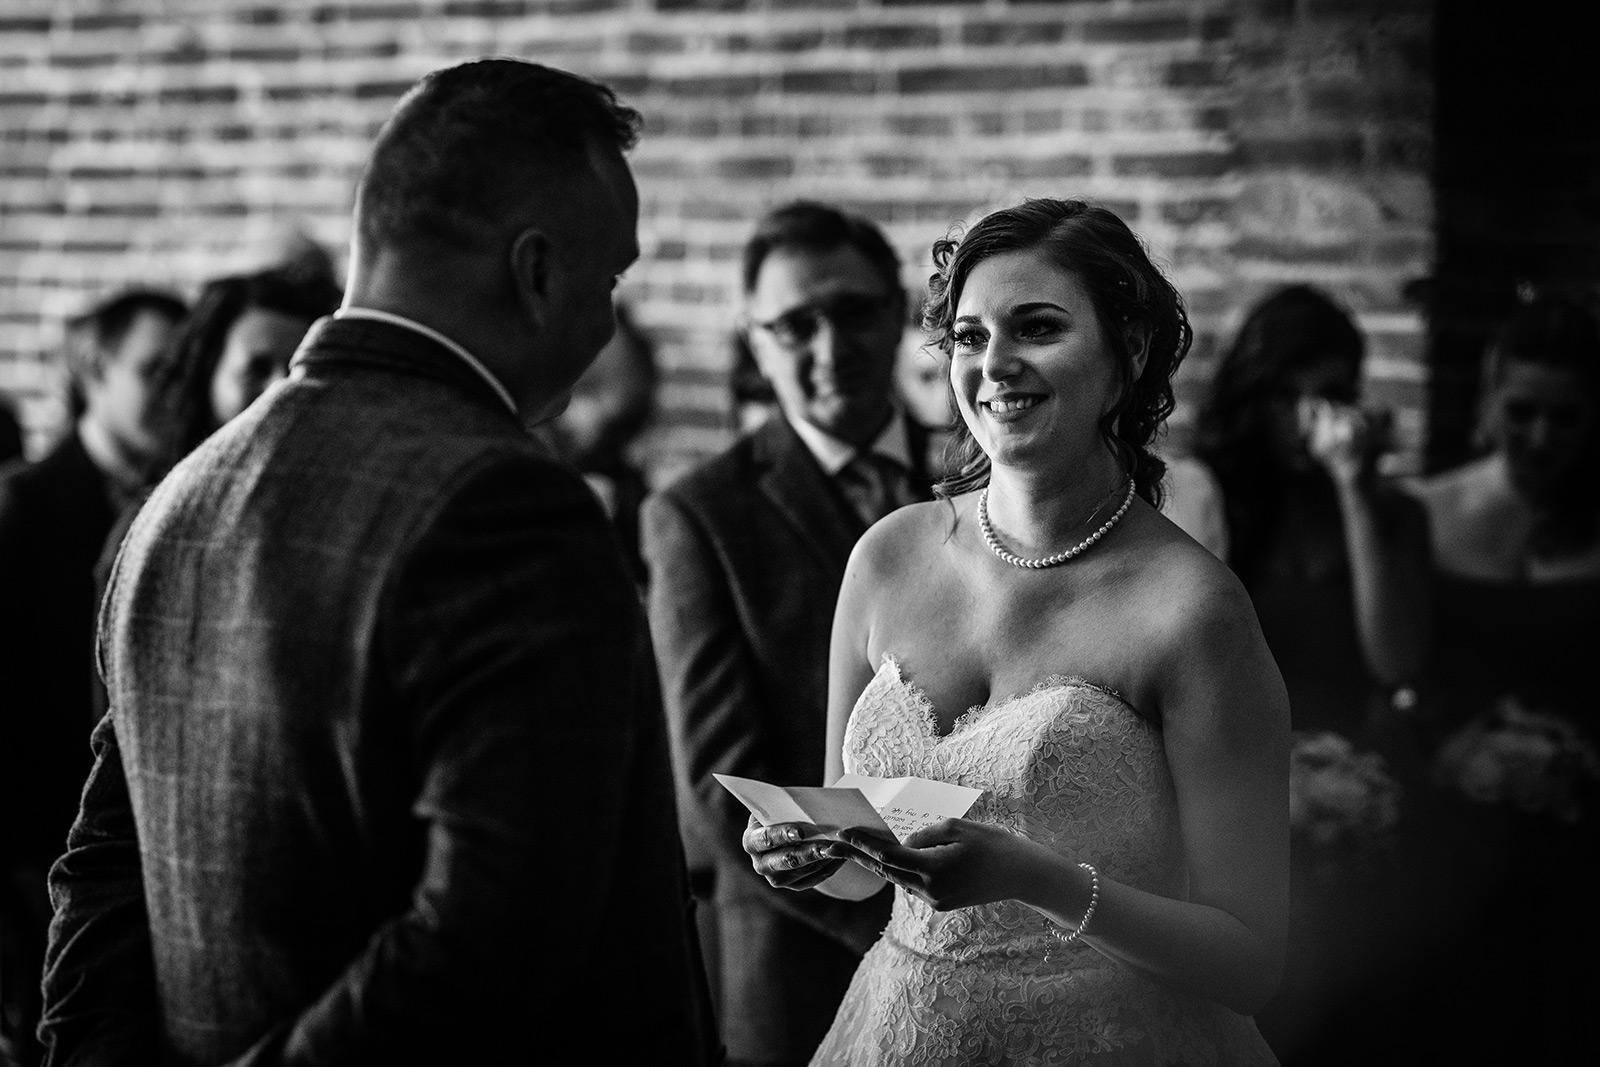 The wedding ceremomny at Hazel Gap Barn